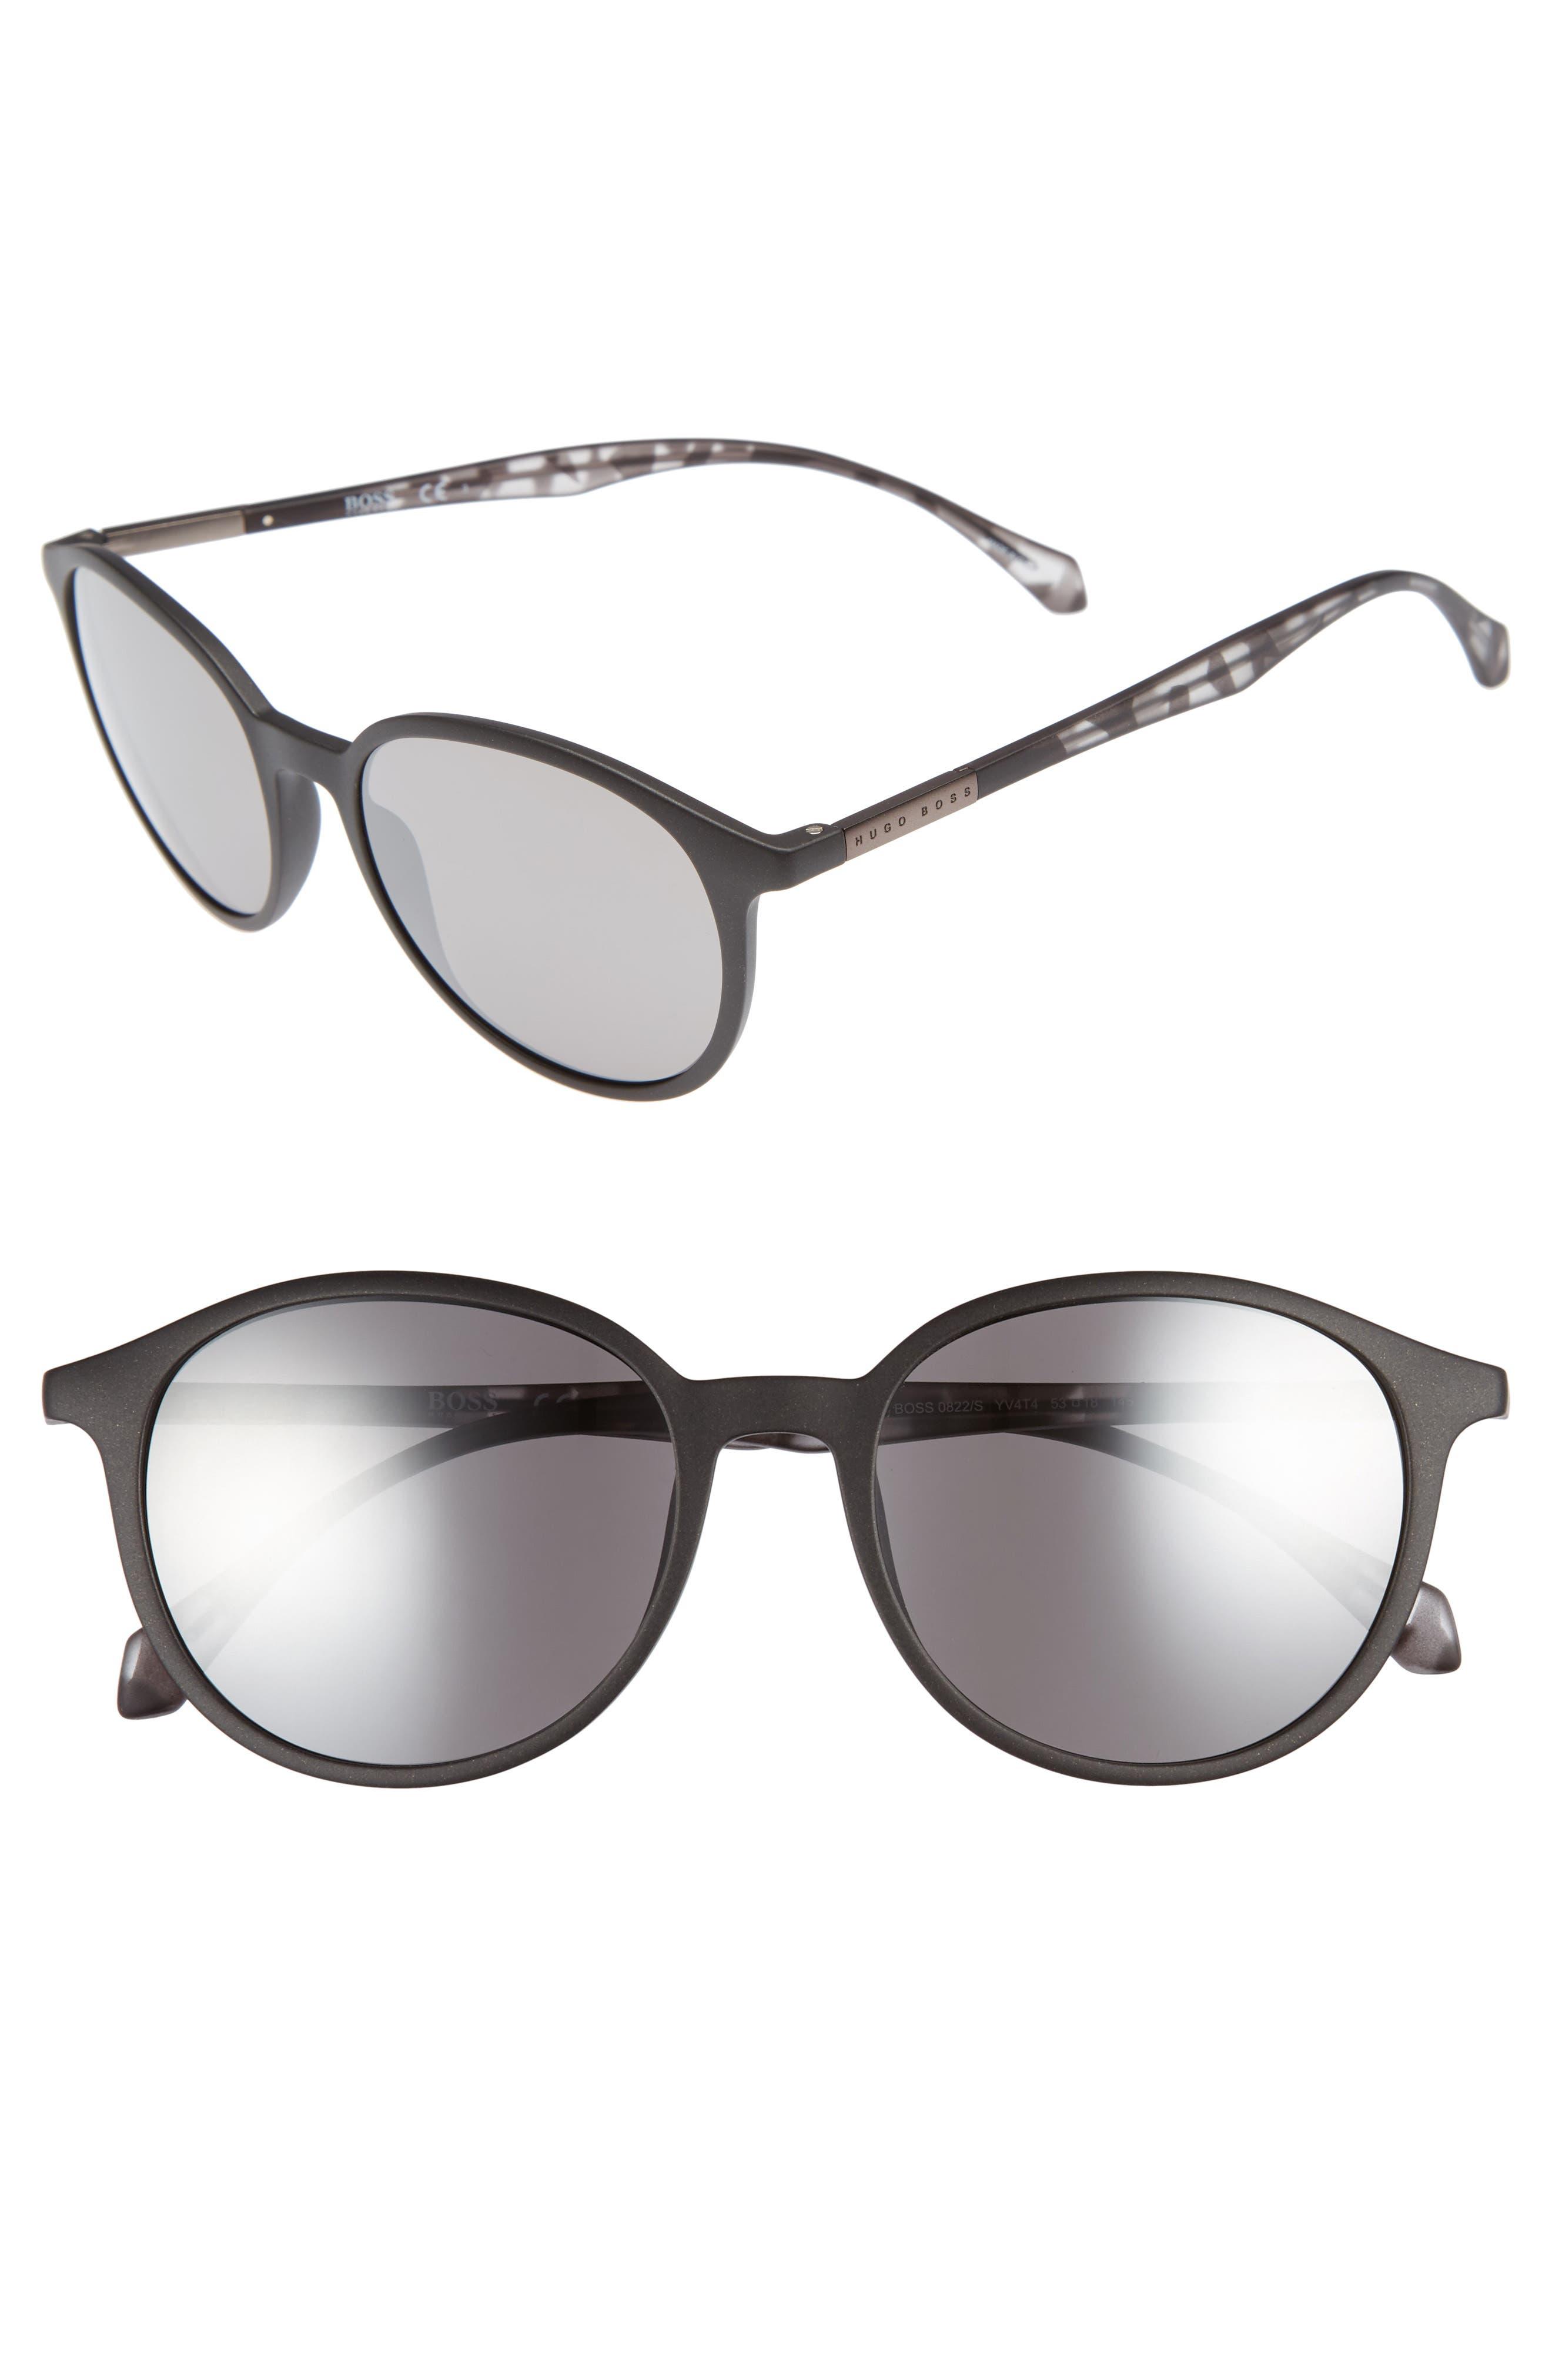 53mm Sunglasses,                             Main thumbnail 1, color,                             Black Grey Havana